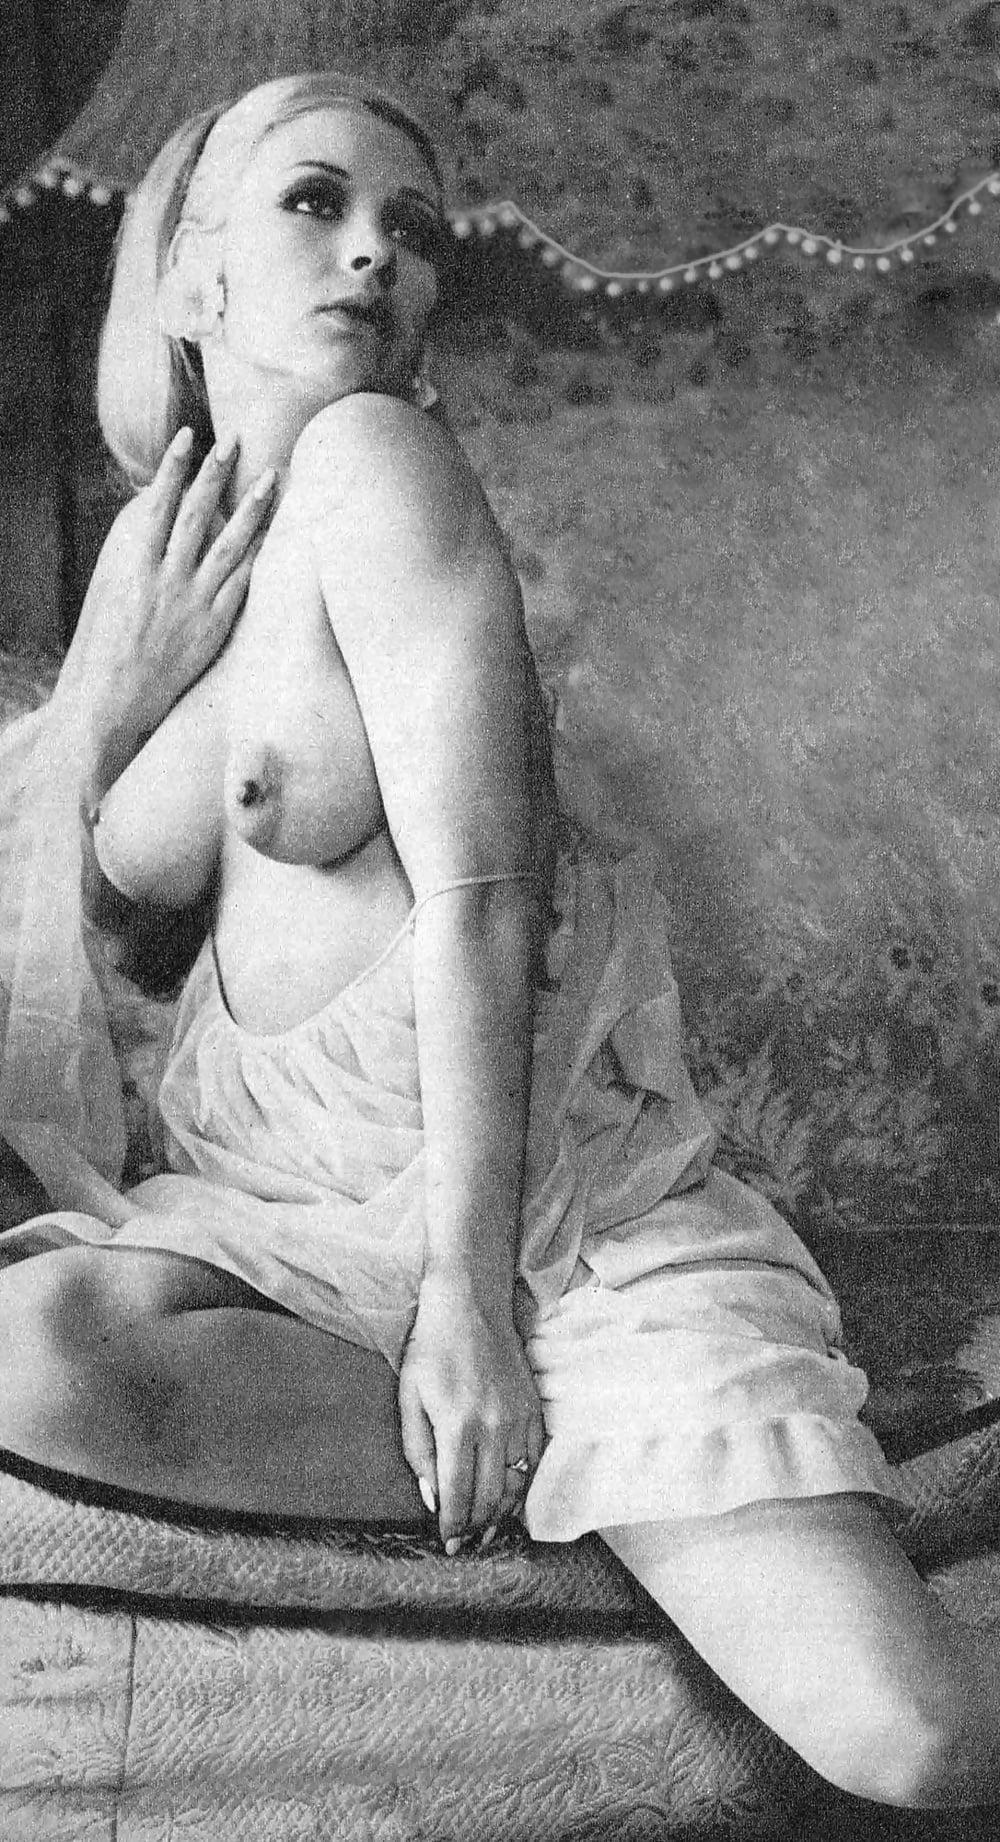 Instant orgy 1967 - 1 part 2